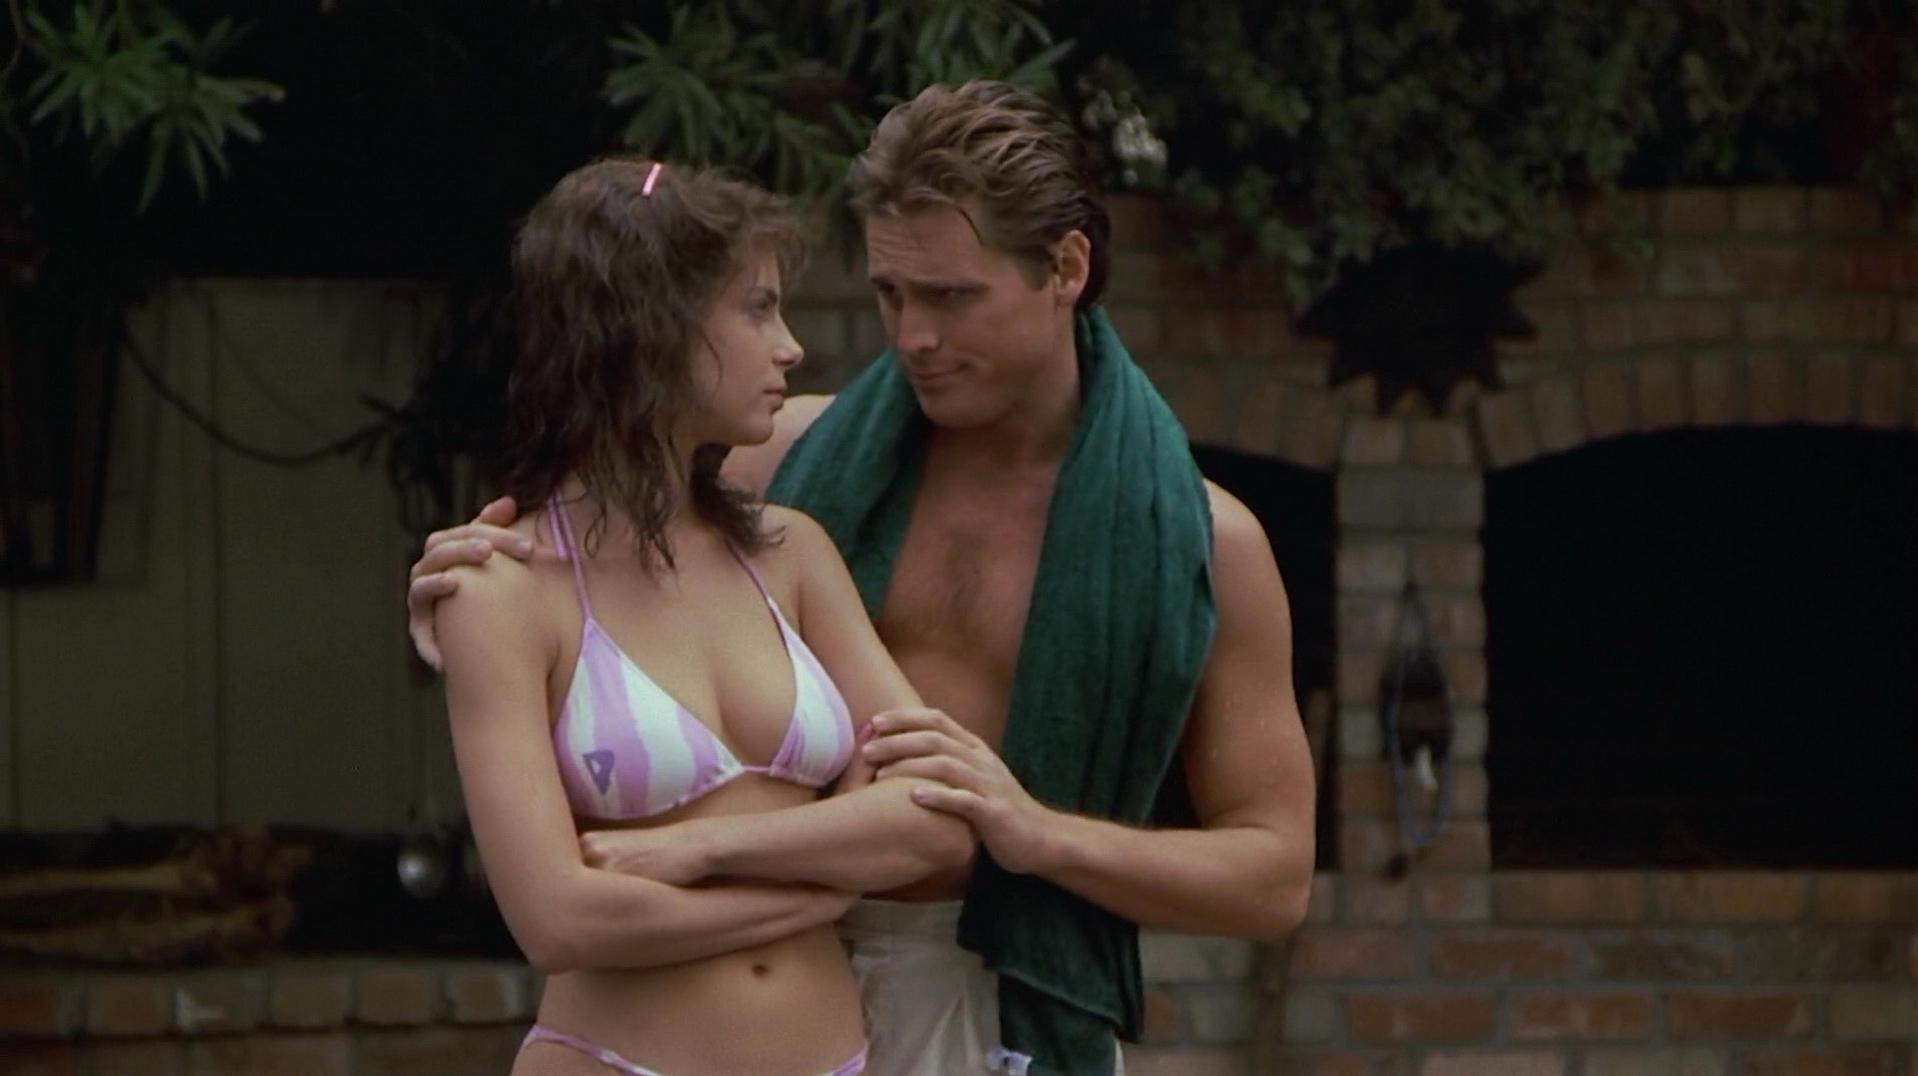 joyce hyser topless